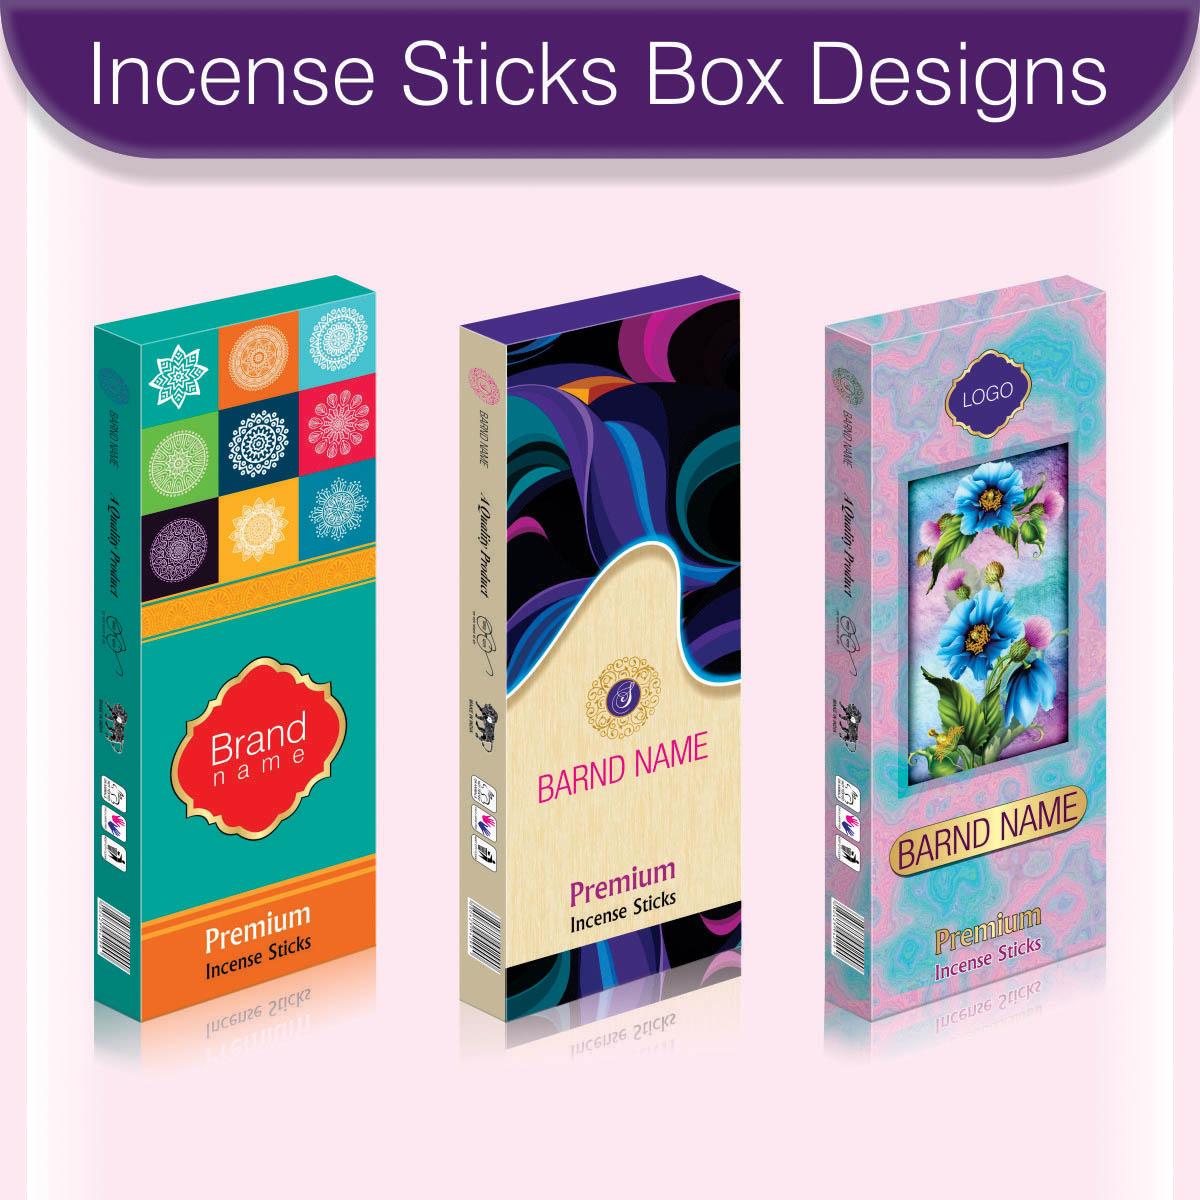 Incense Sticks Box Designs Design Sagar